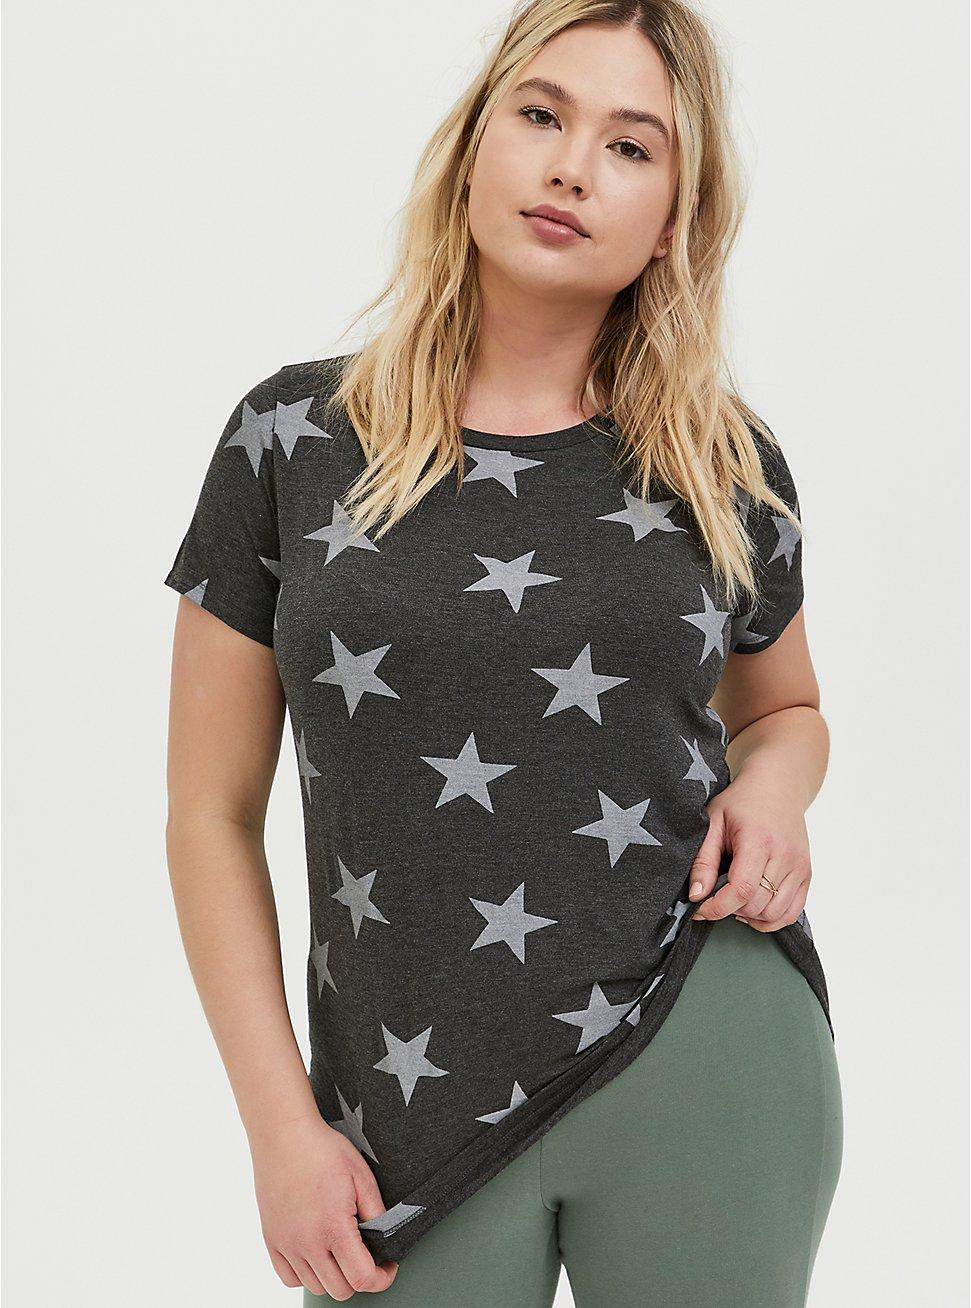 Plus Size Slim Fit Crew Tee - Super Soft Stars Charcoal Grey, STARS-BLACK, hi-res